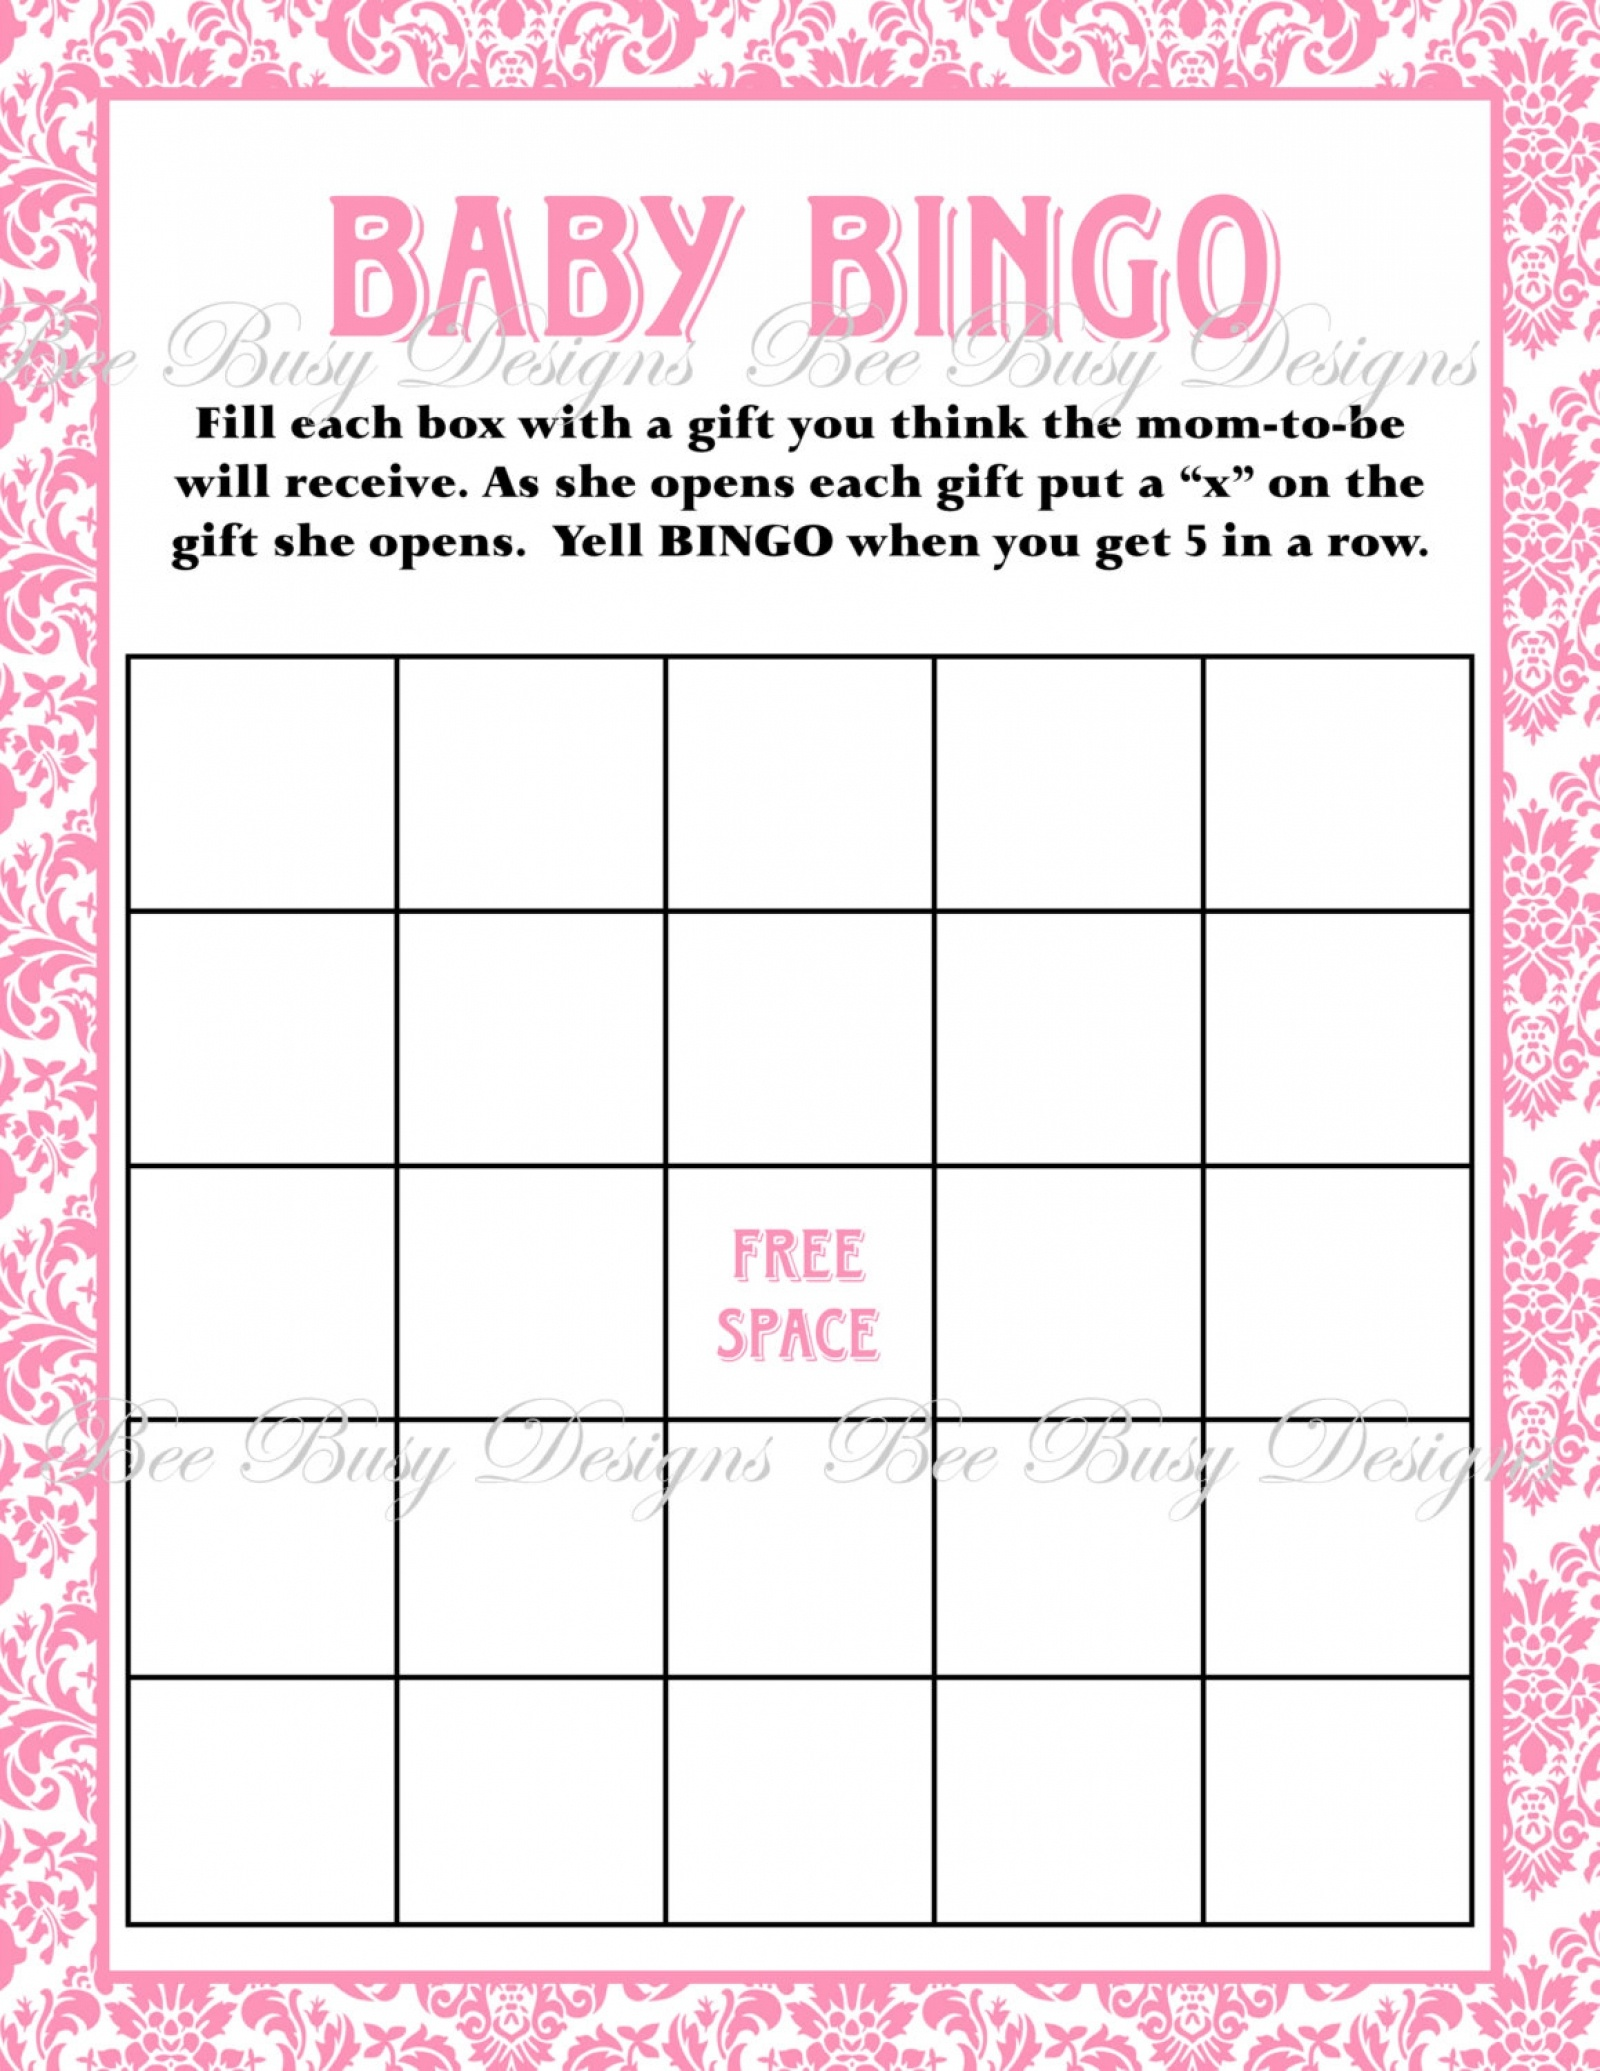 Printable Pink Damask Baby Shower Bingo Game Instant Download   Bee - Baby Bingo Game Free Printable